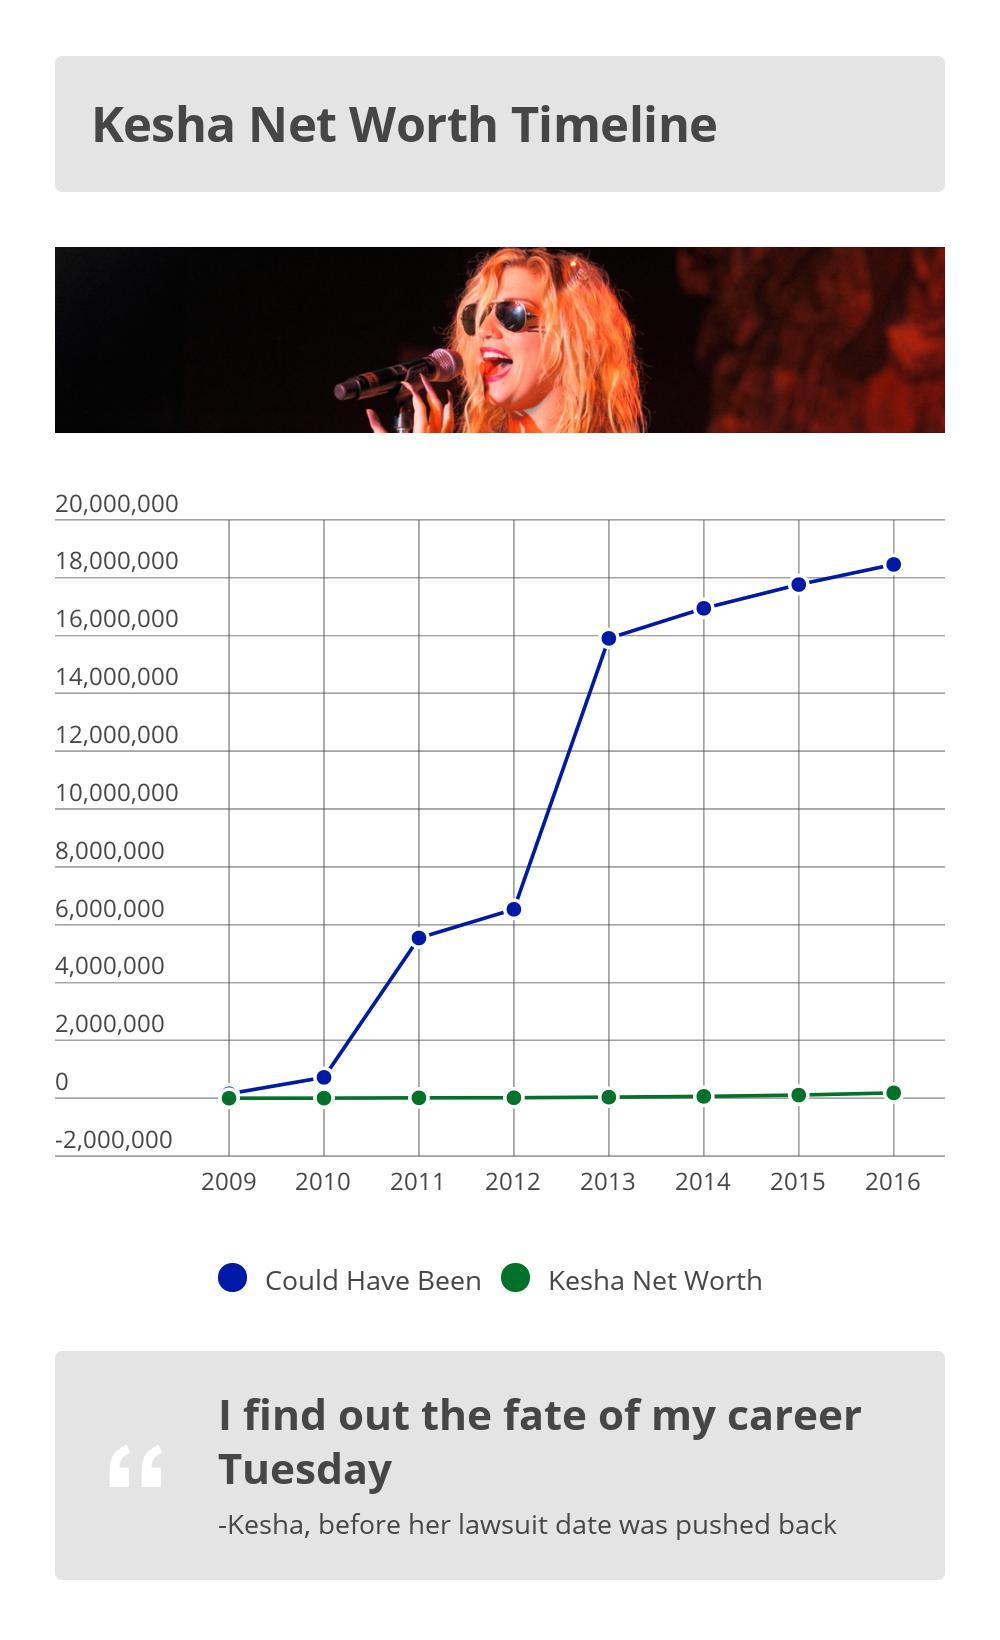 Kesha Net Worth Over Time